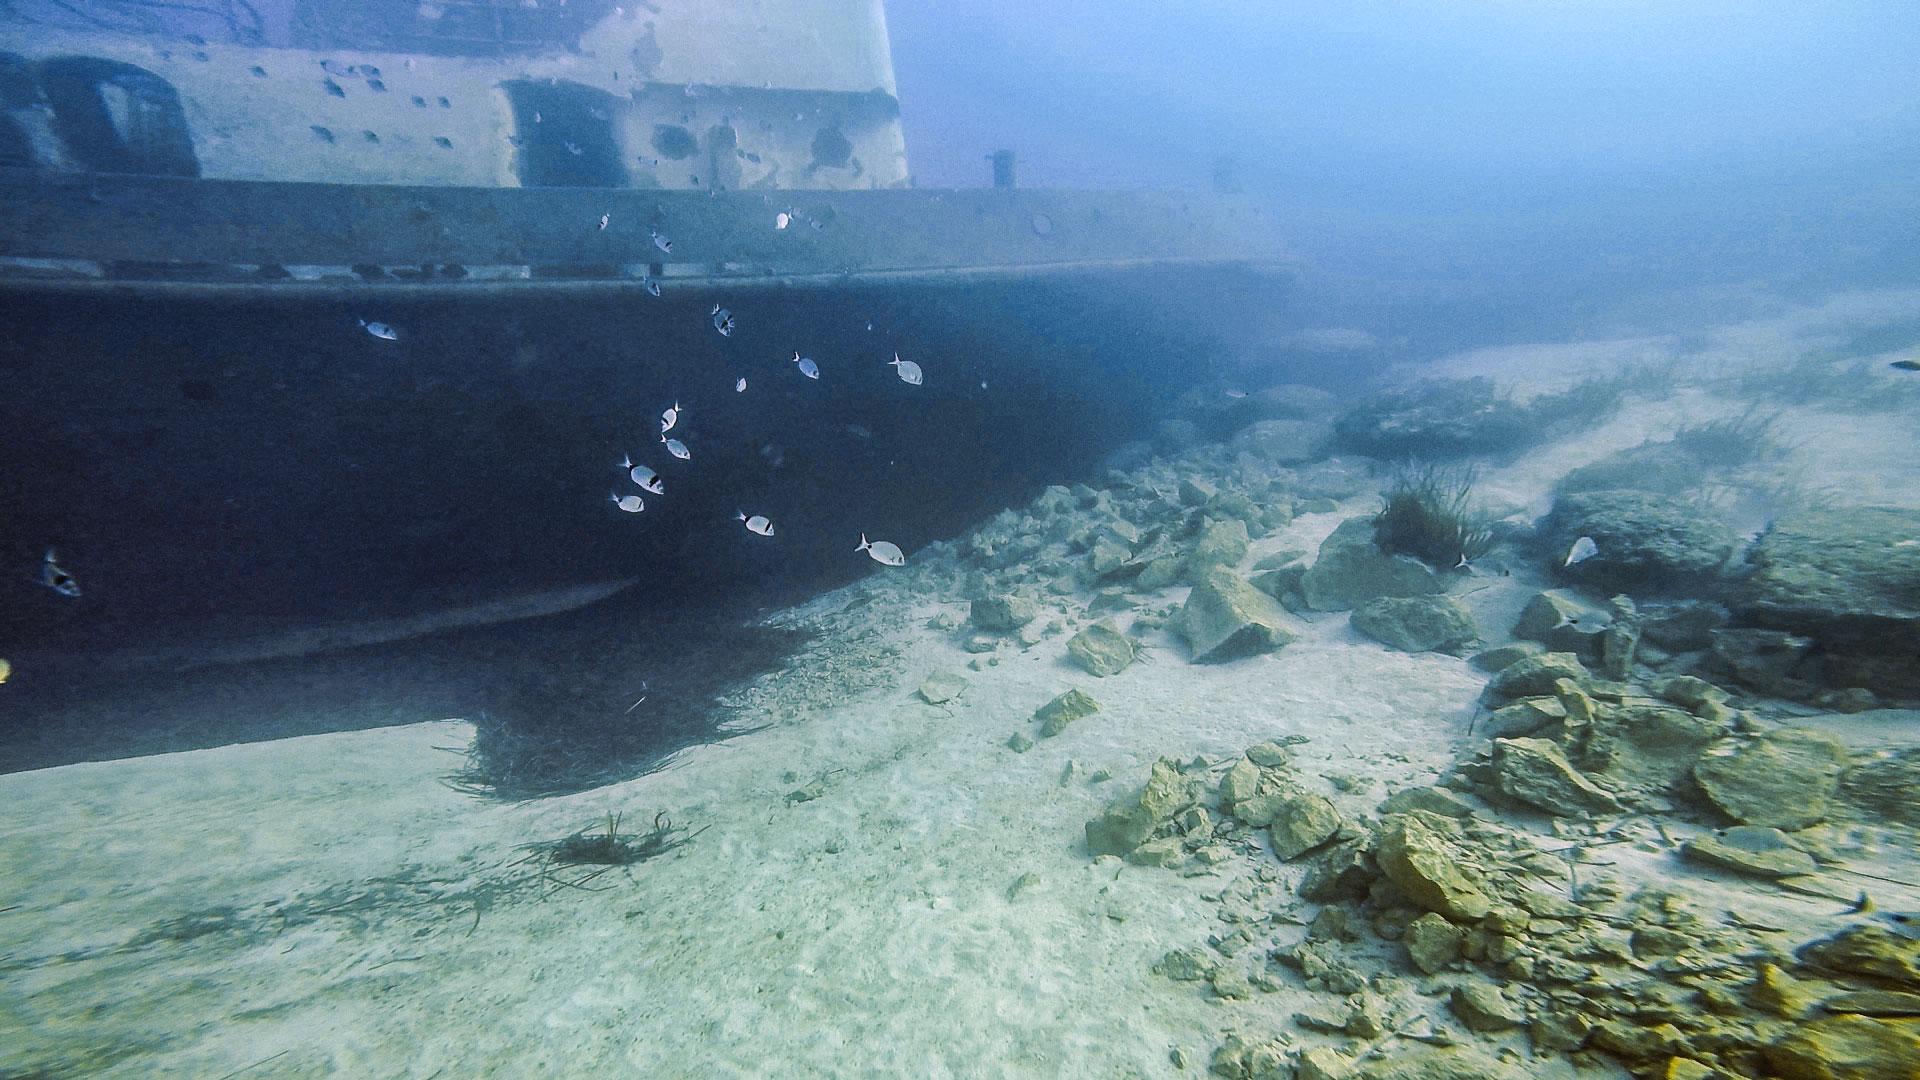 Tug 2 wreck